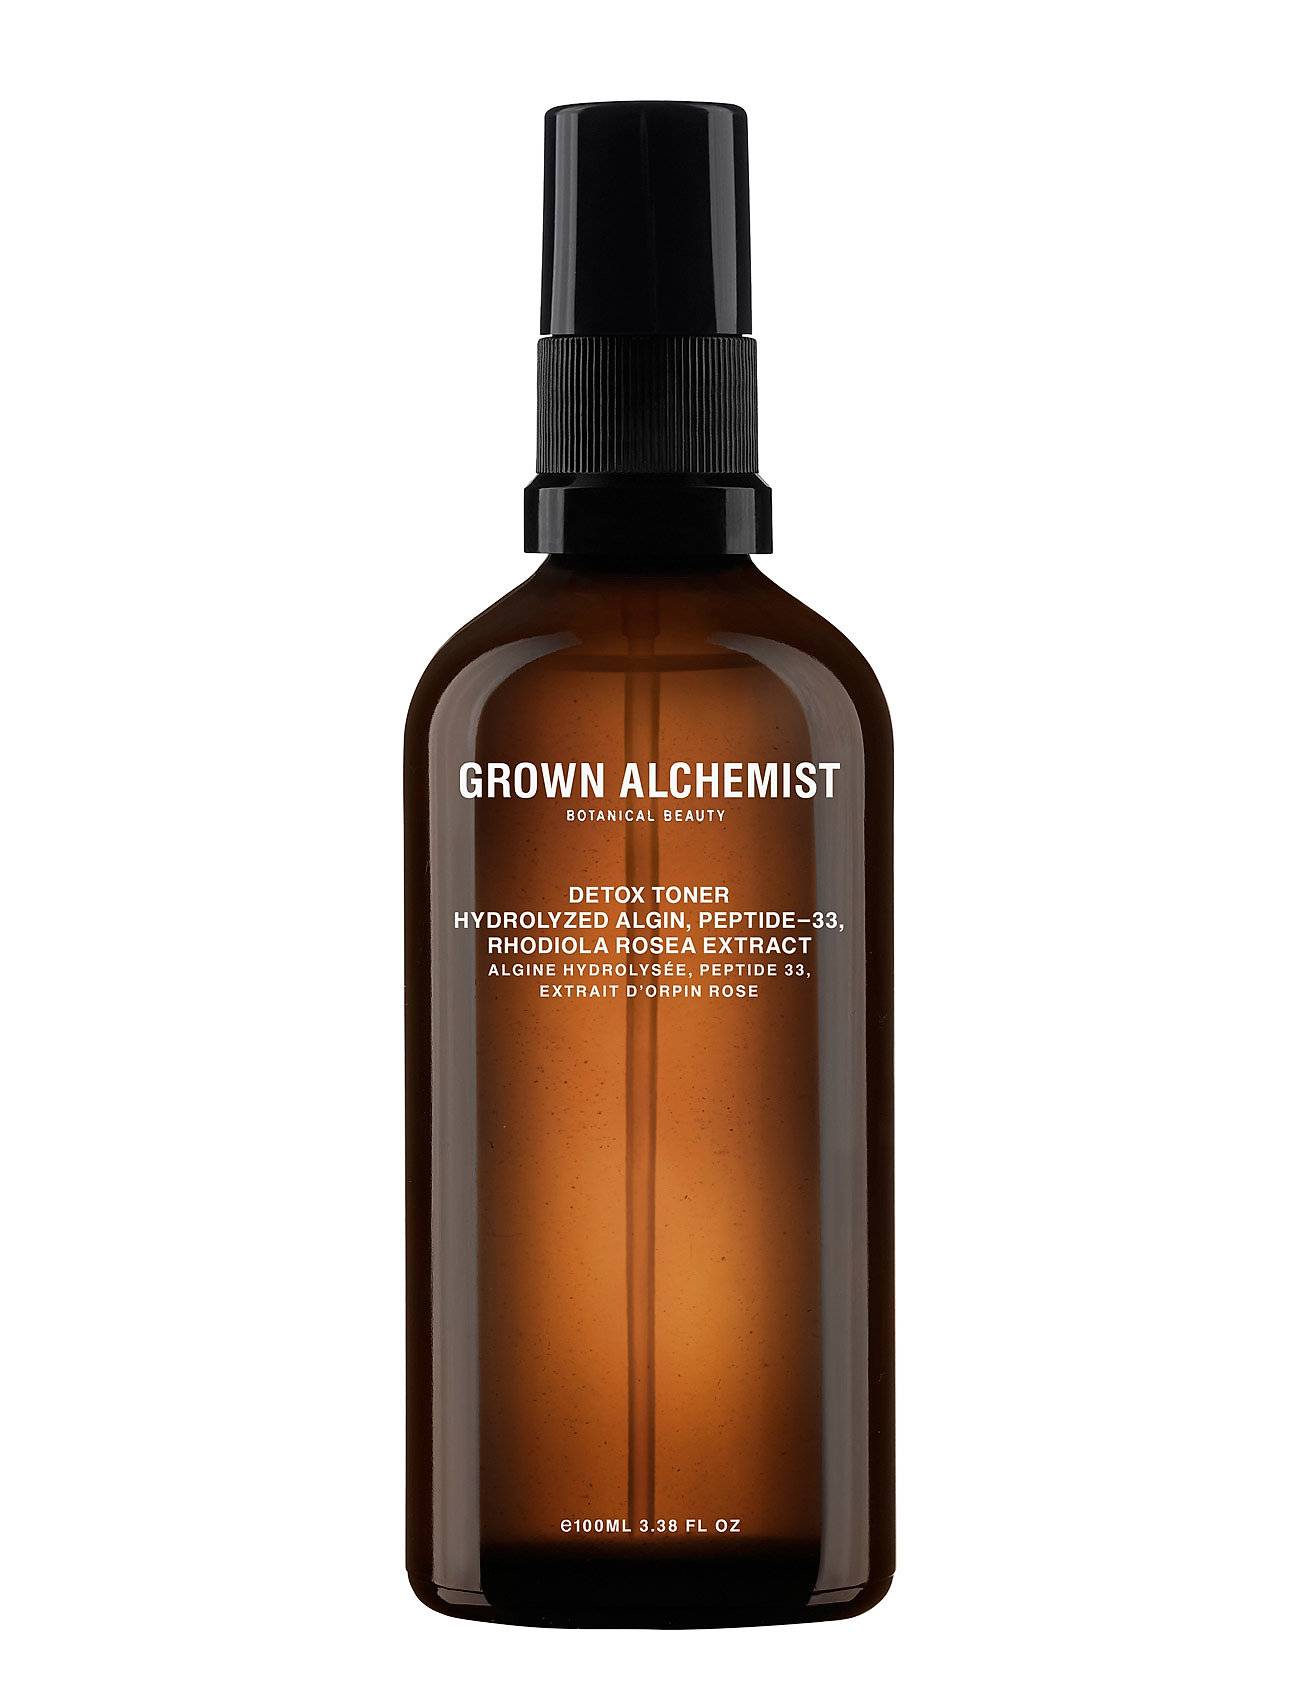 Grown Alchemist Detox T R Mist Kasvojen Ihonhoito Nude Grown Alchemist